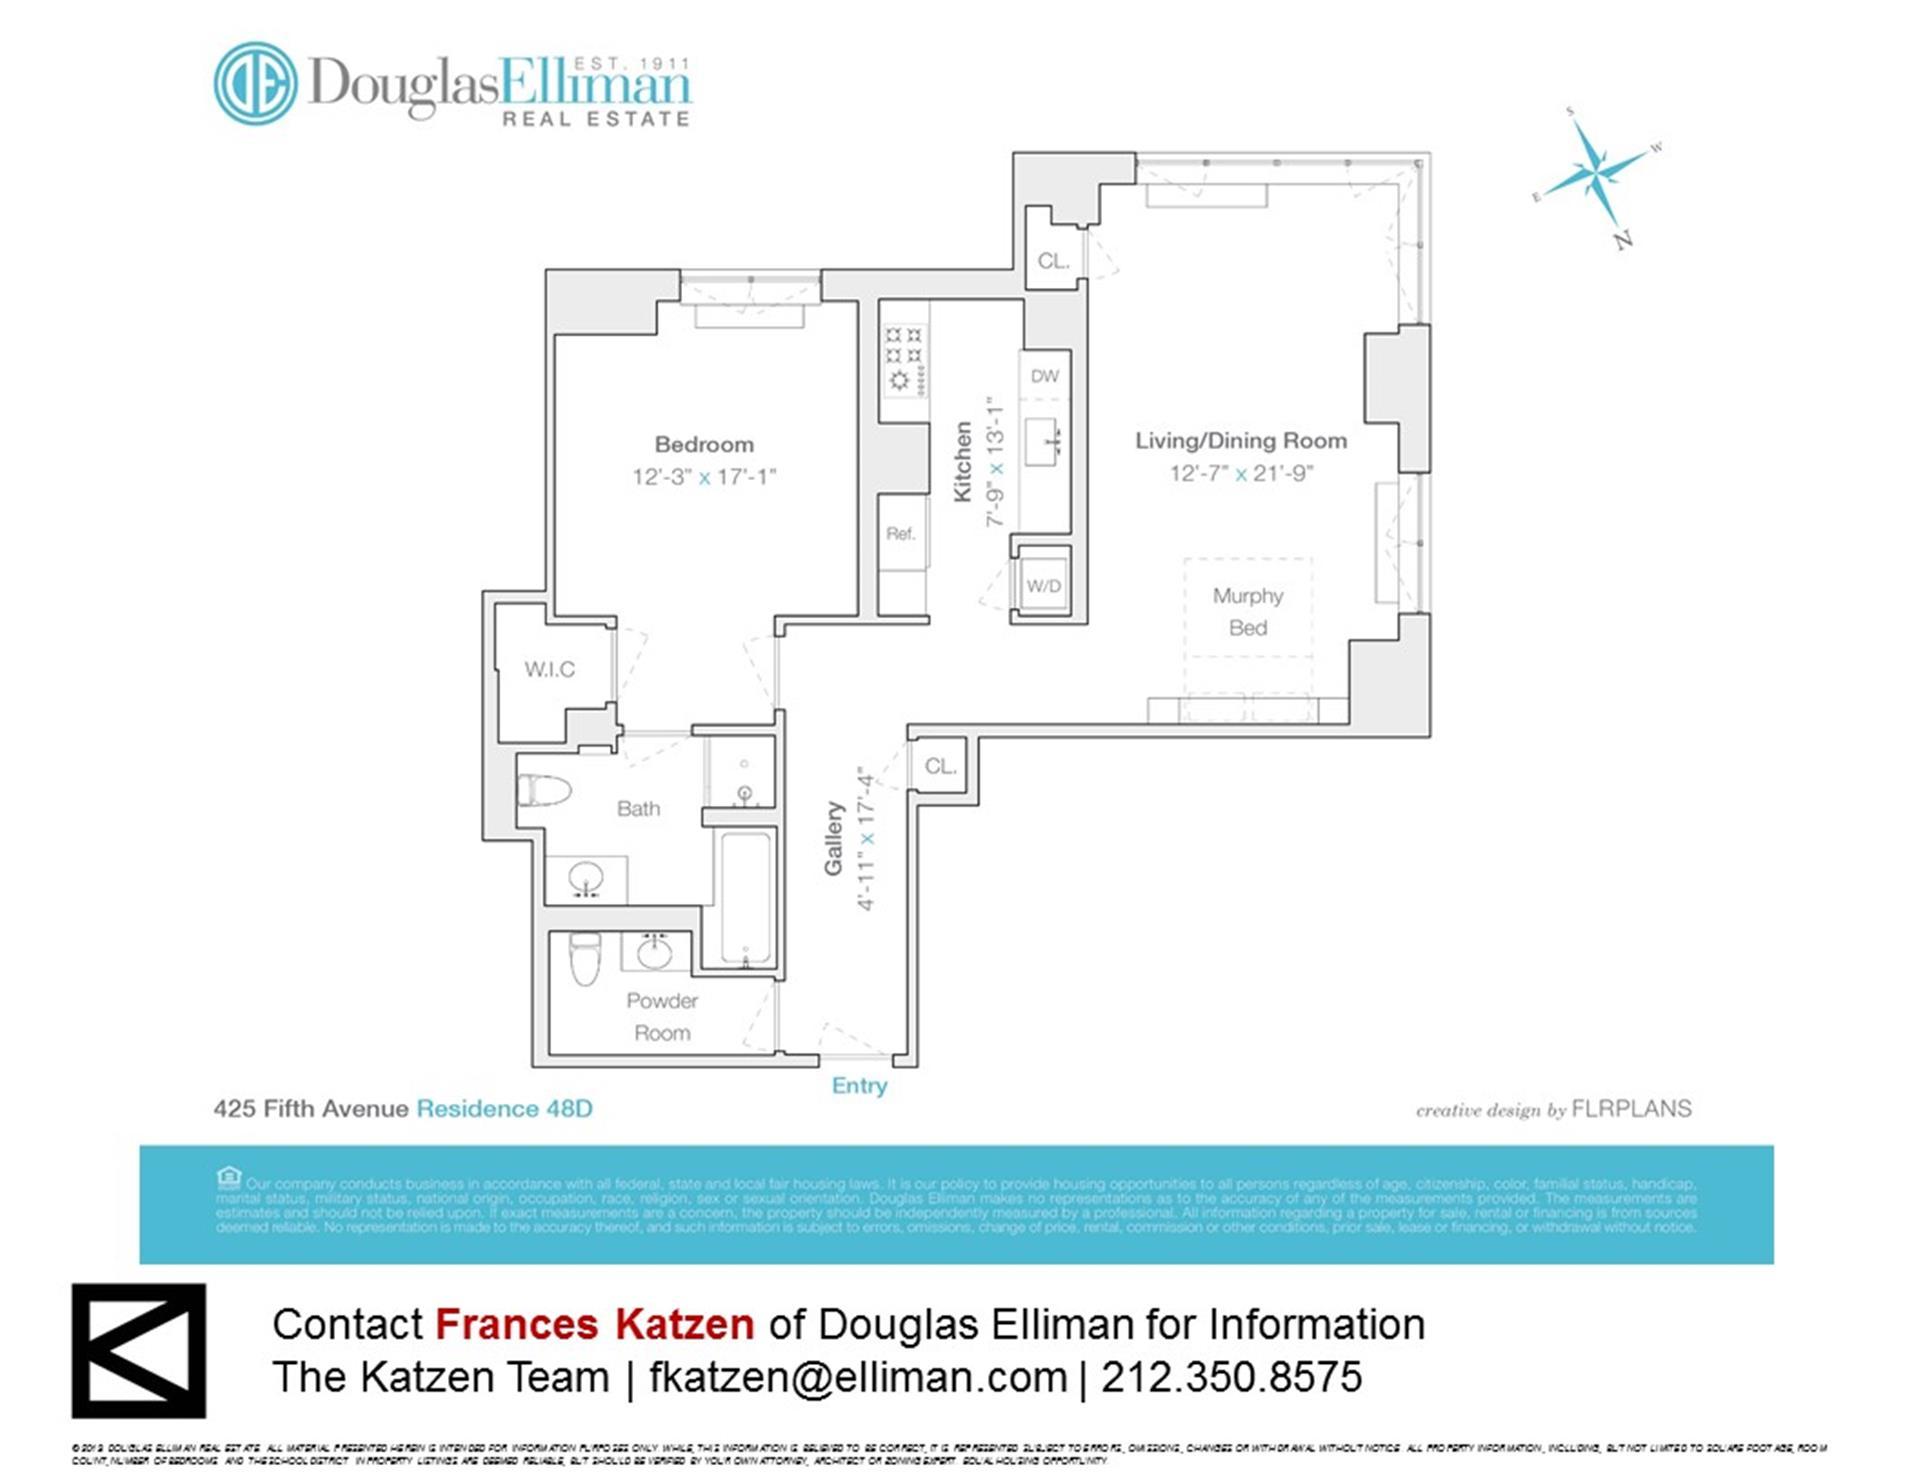 Floor plan of 425 Fifth Avenue, 48D - Murray Hill, New York